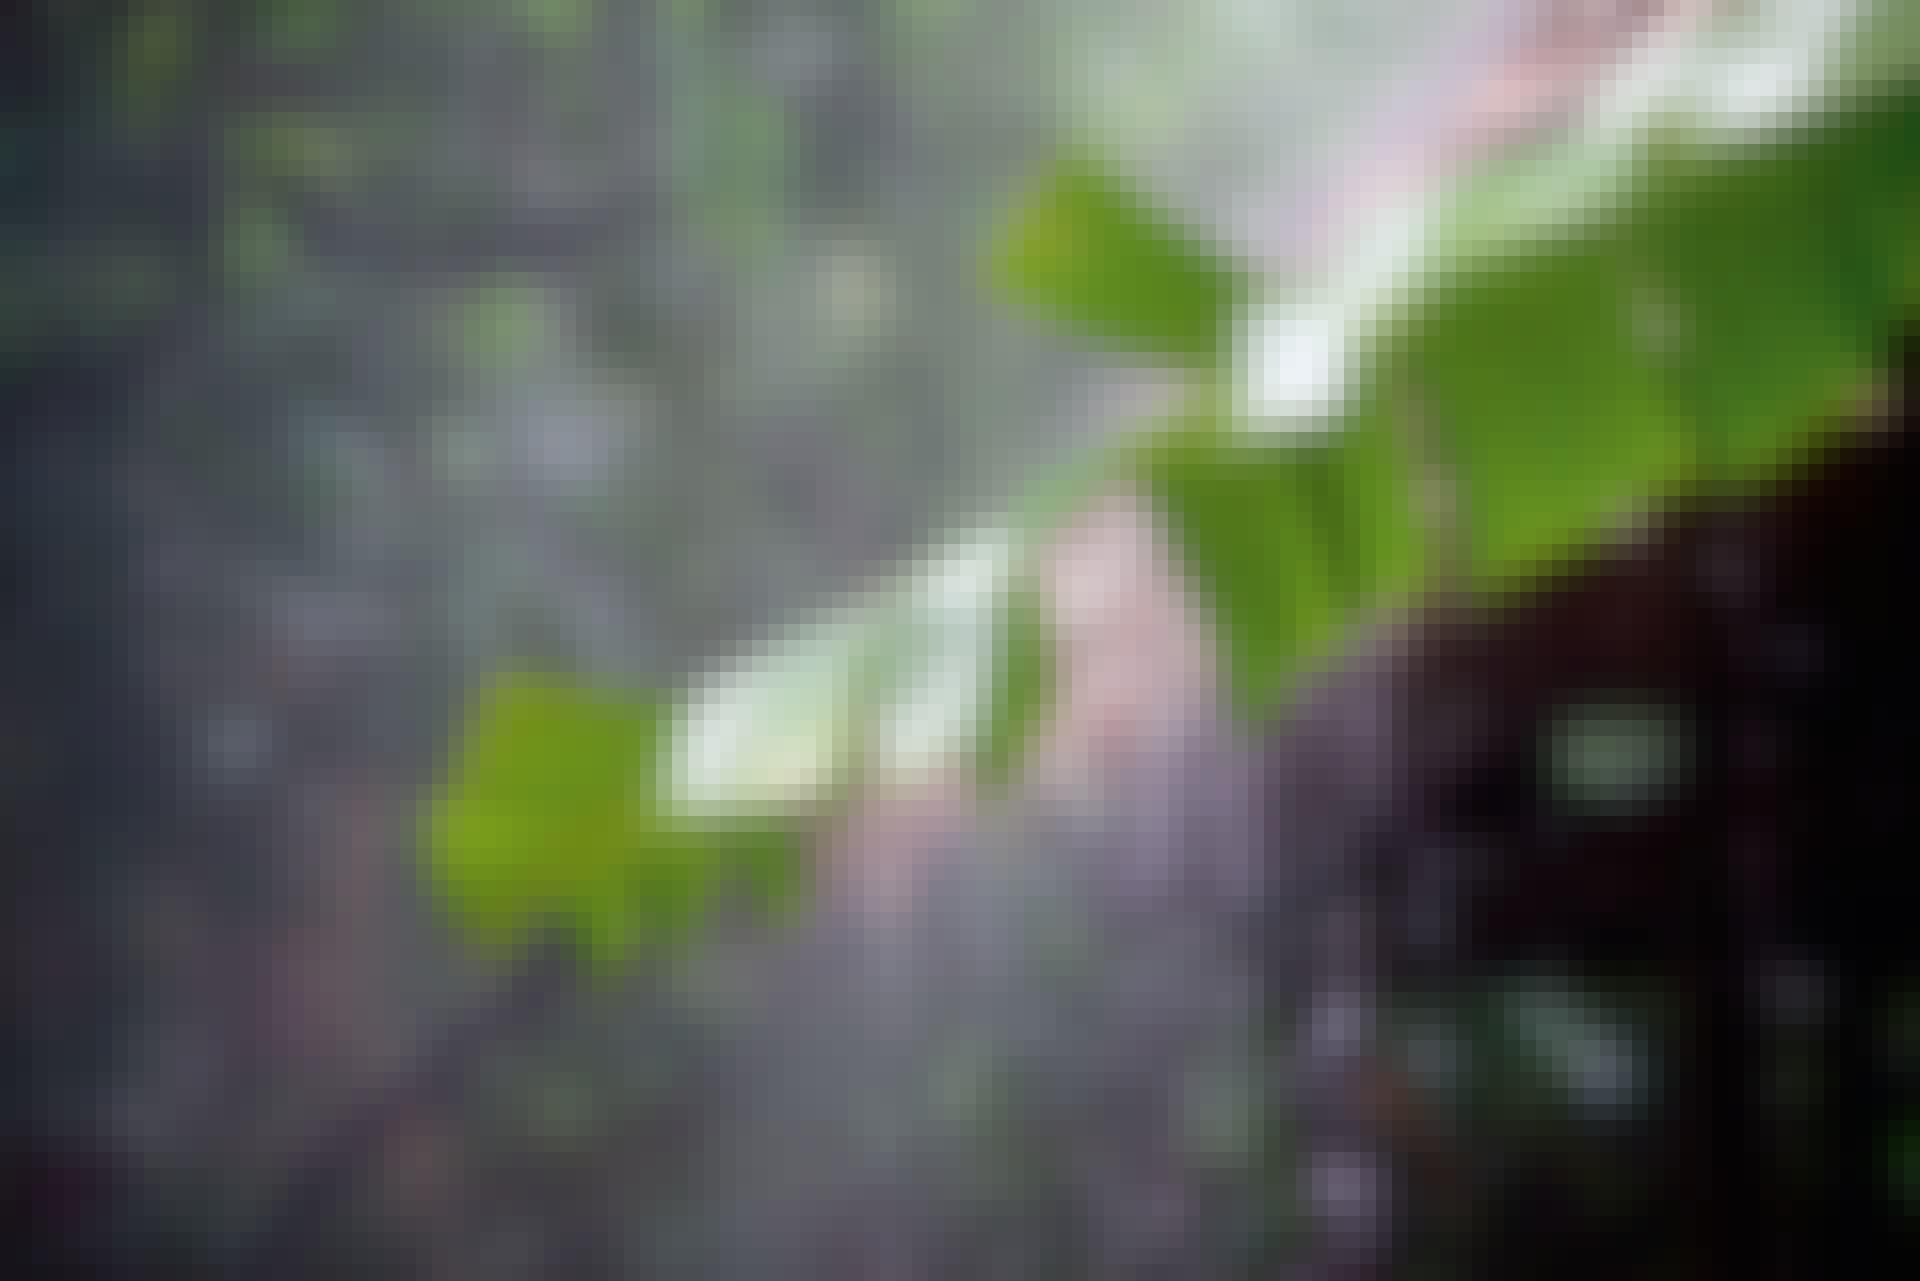 Rain damaging banana leaf